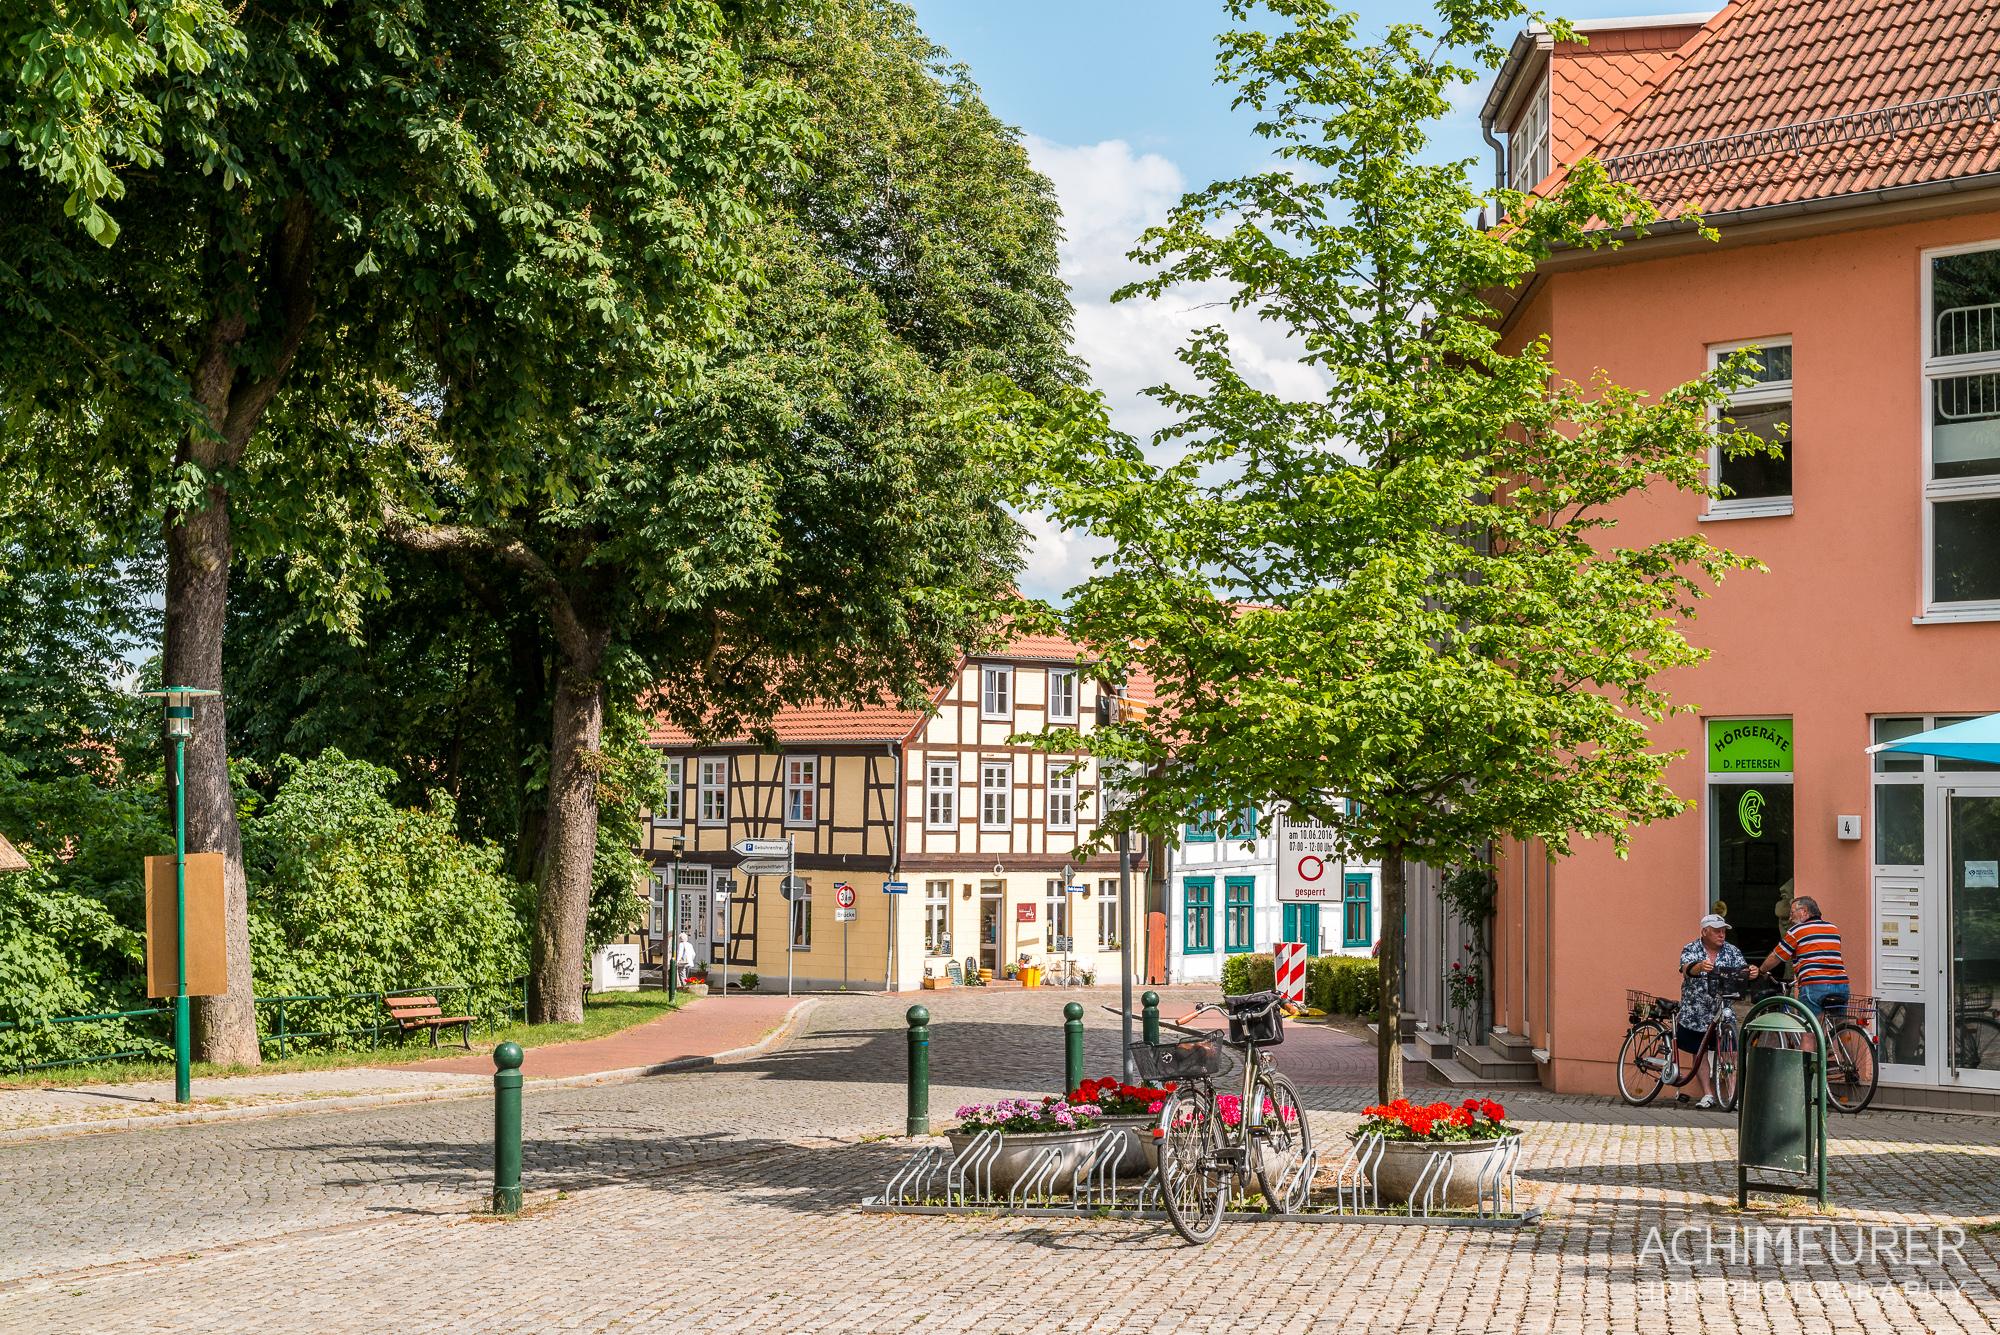 Hausboot-Kuhnle-Mueritz-Mecklenburg-Vorpommern-See_3761